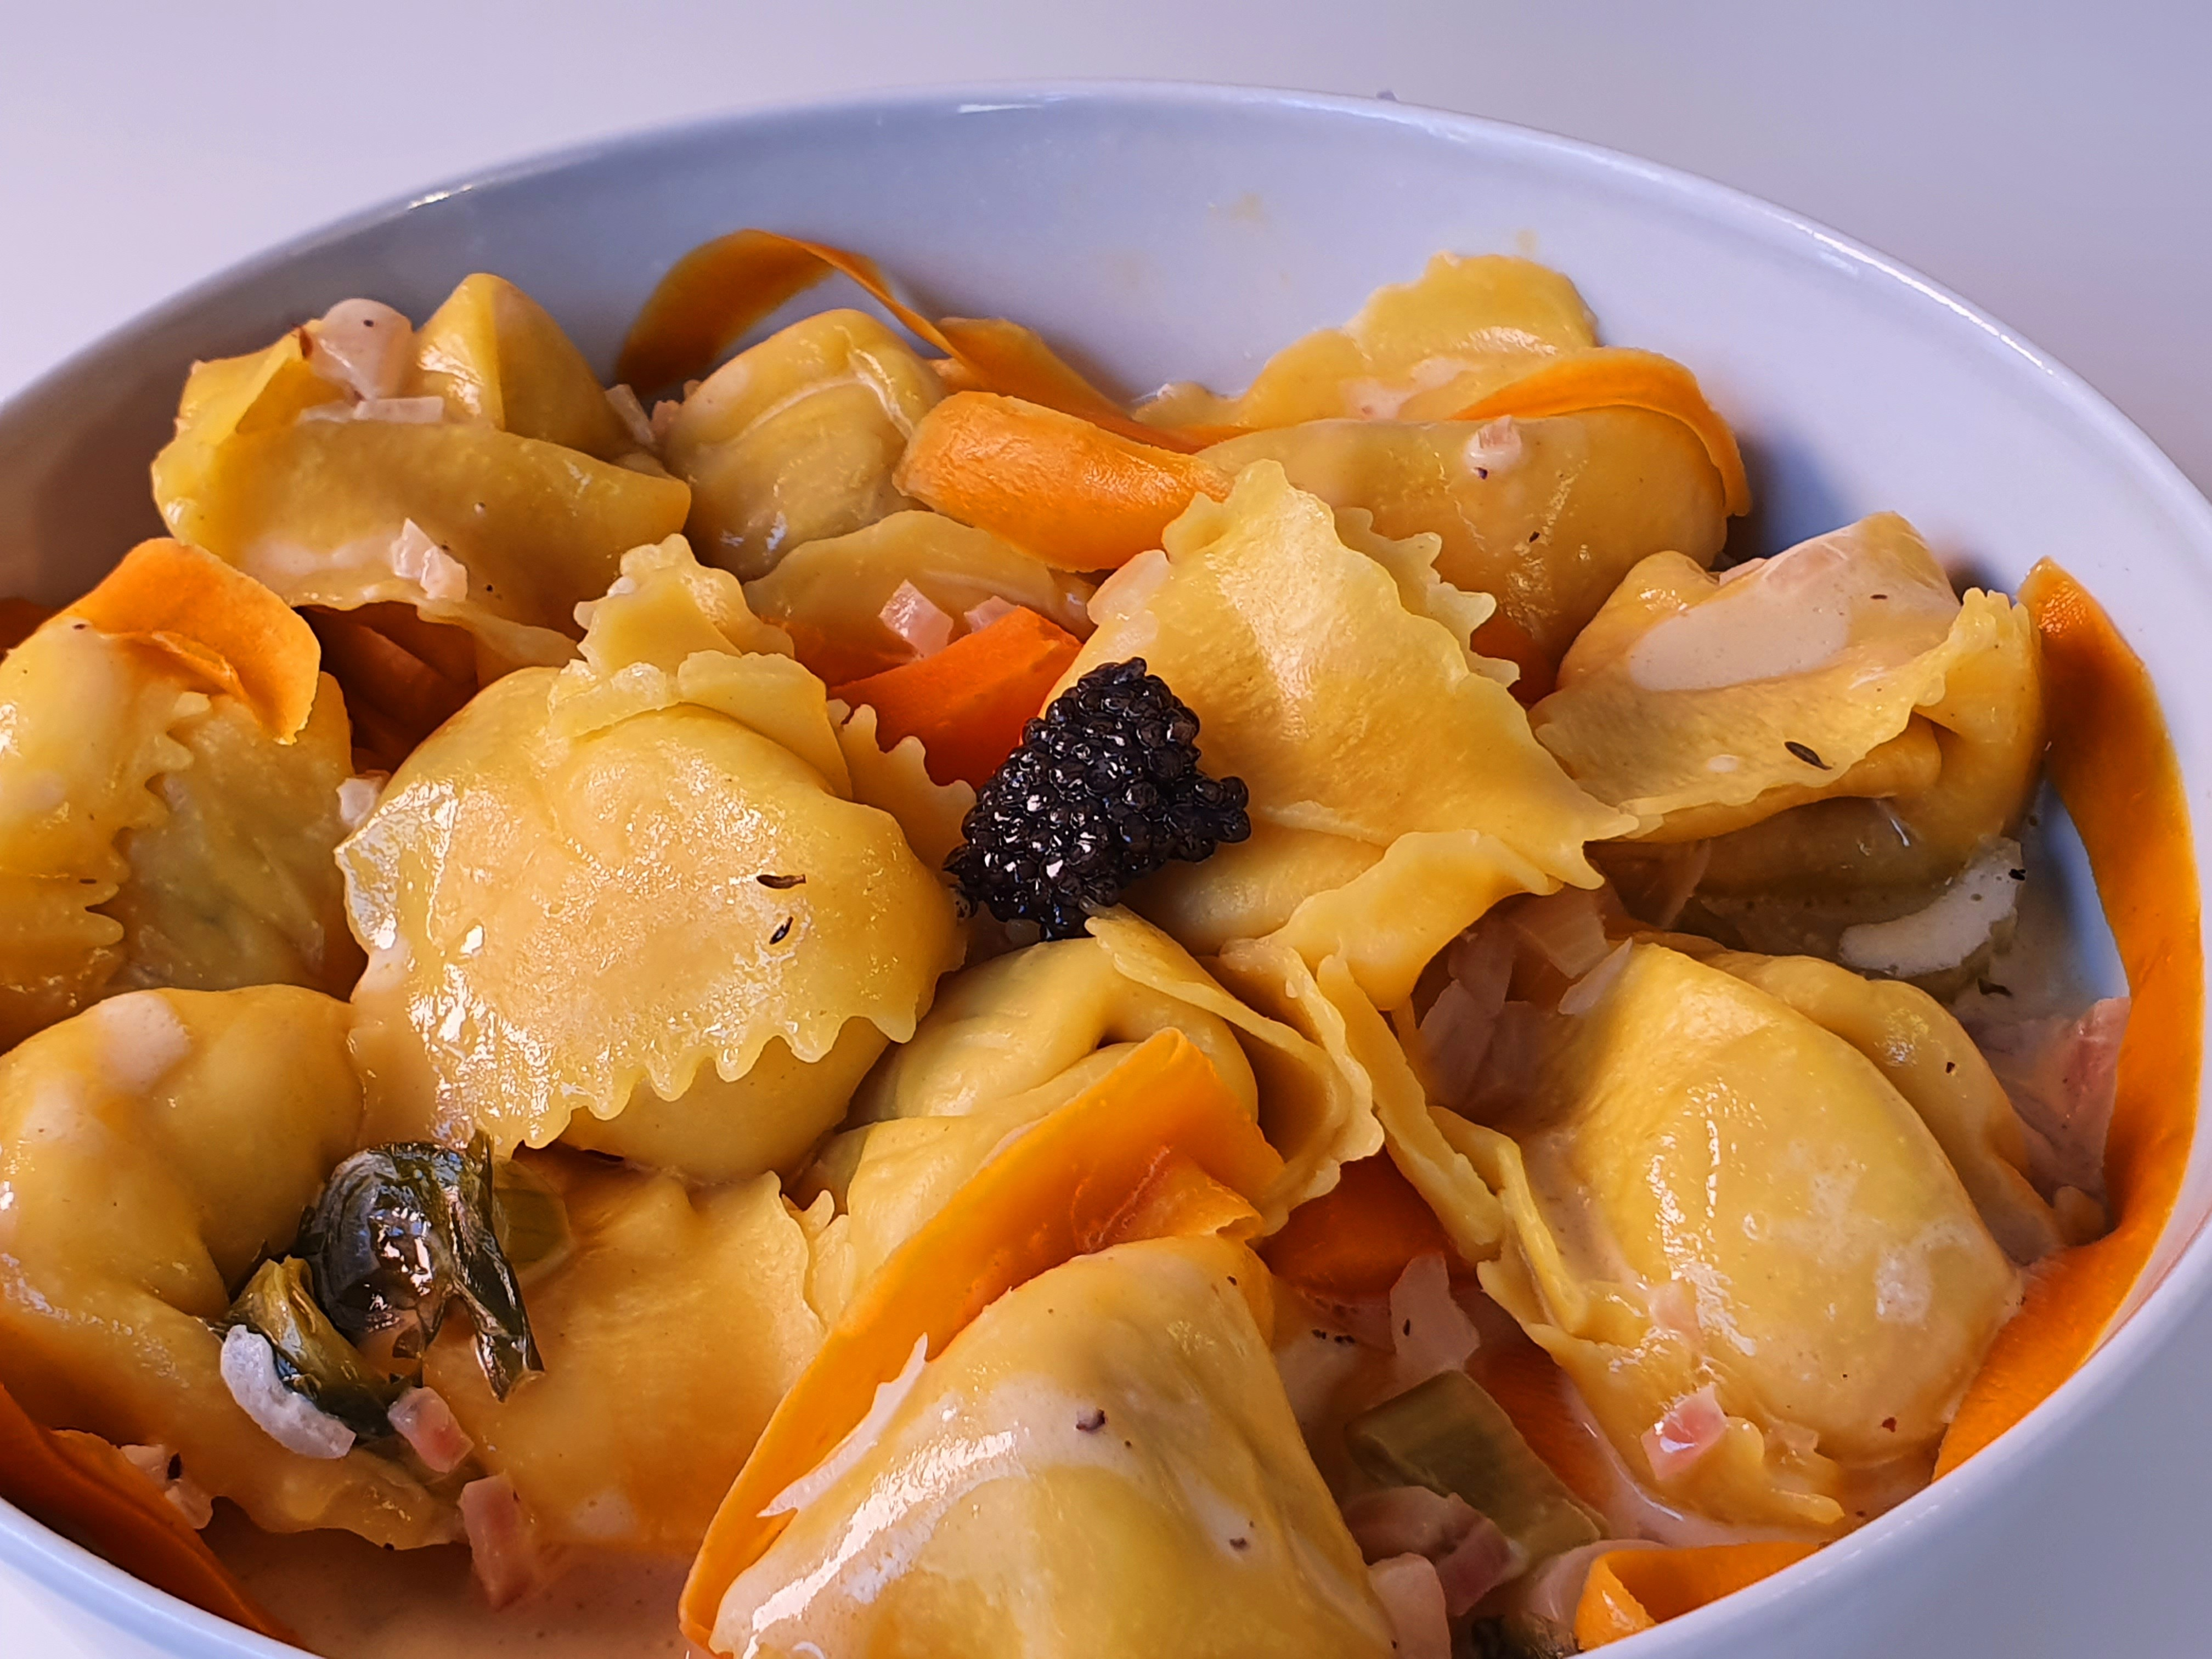 Ravioli stuffed with Sturgeon, Caviar and seafood topping